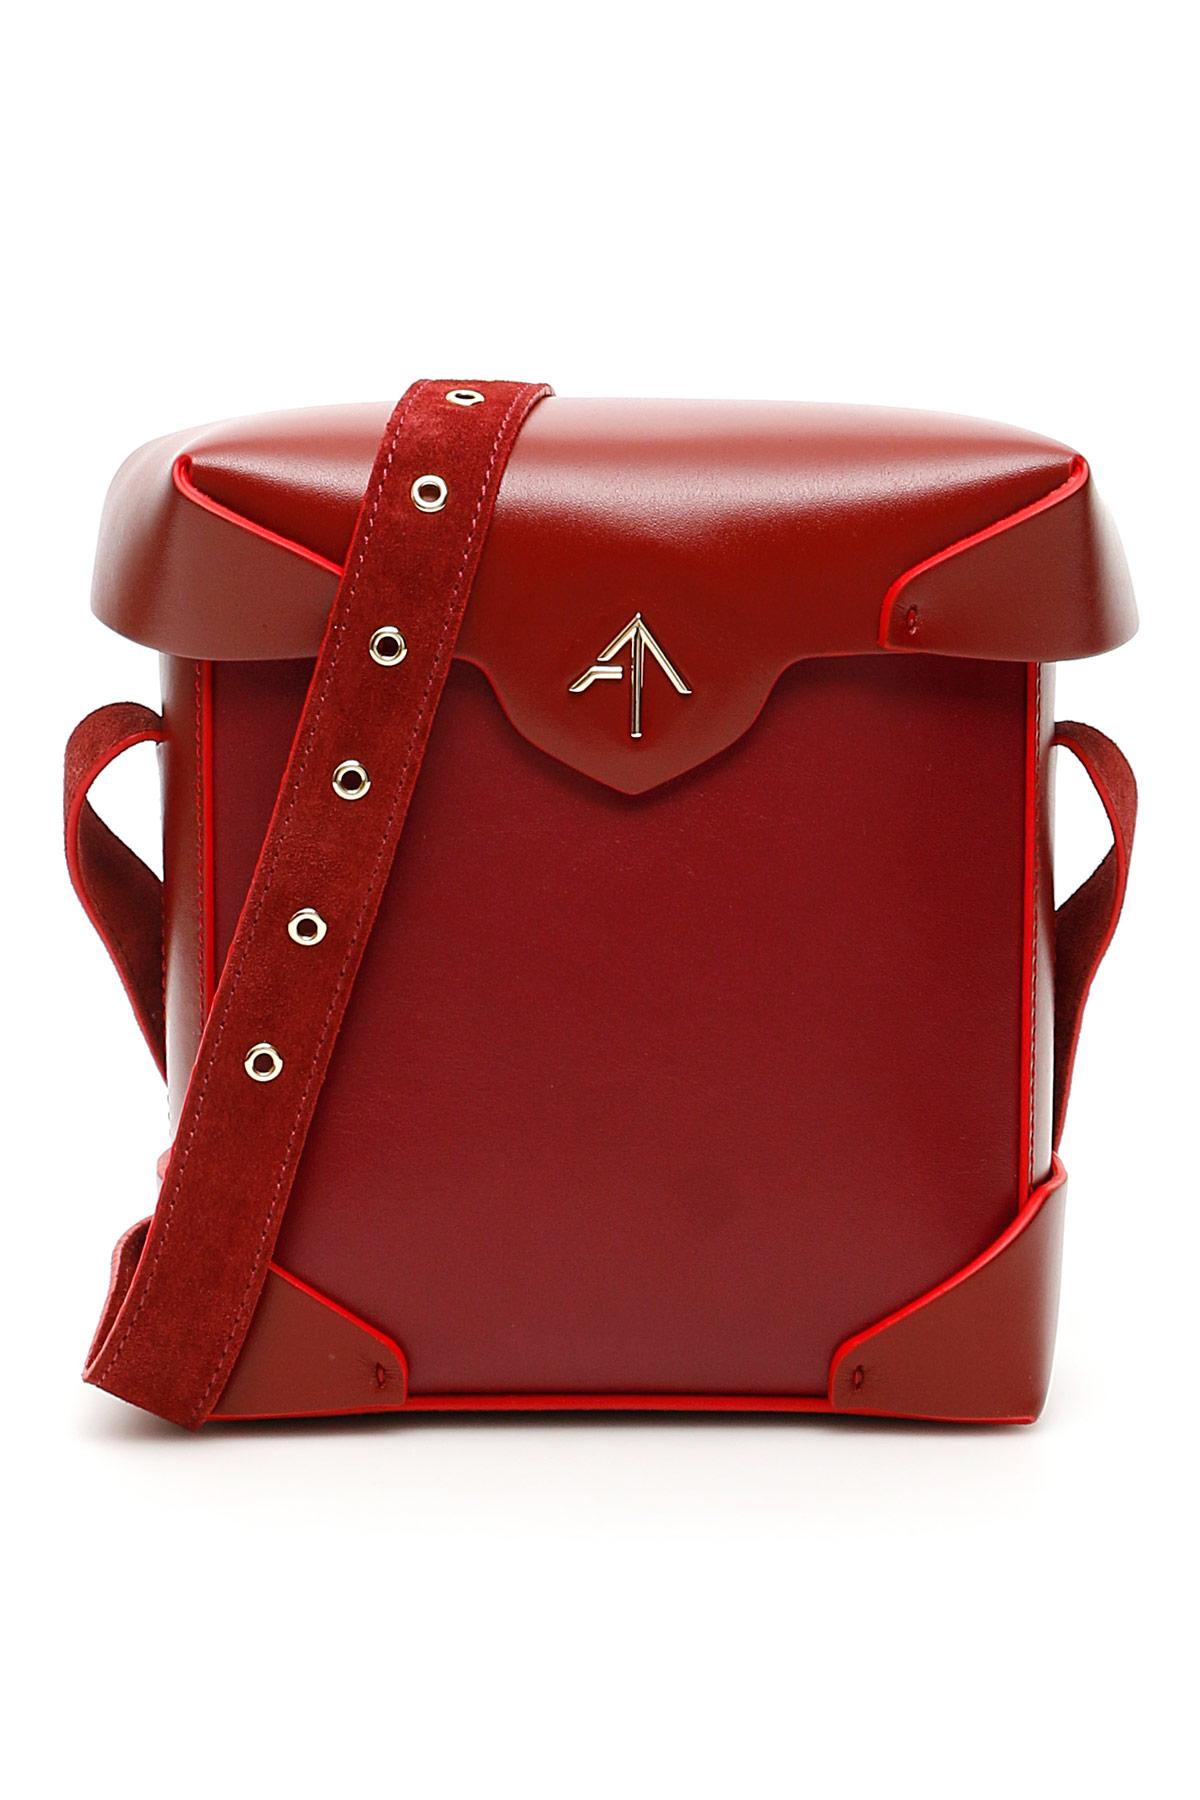 MANU ATELIER MINI PRISTINE BAG OS Red Leather